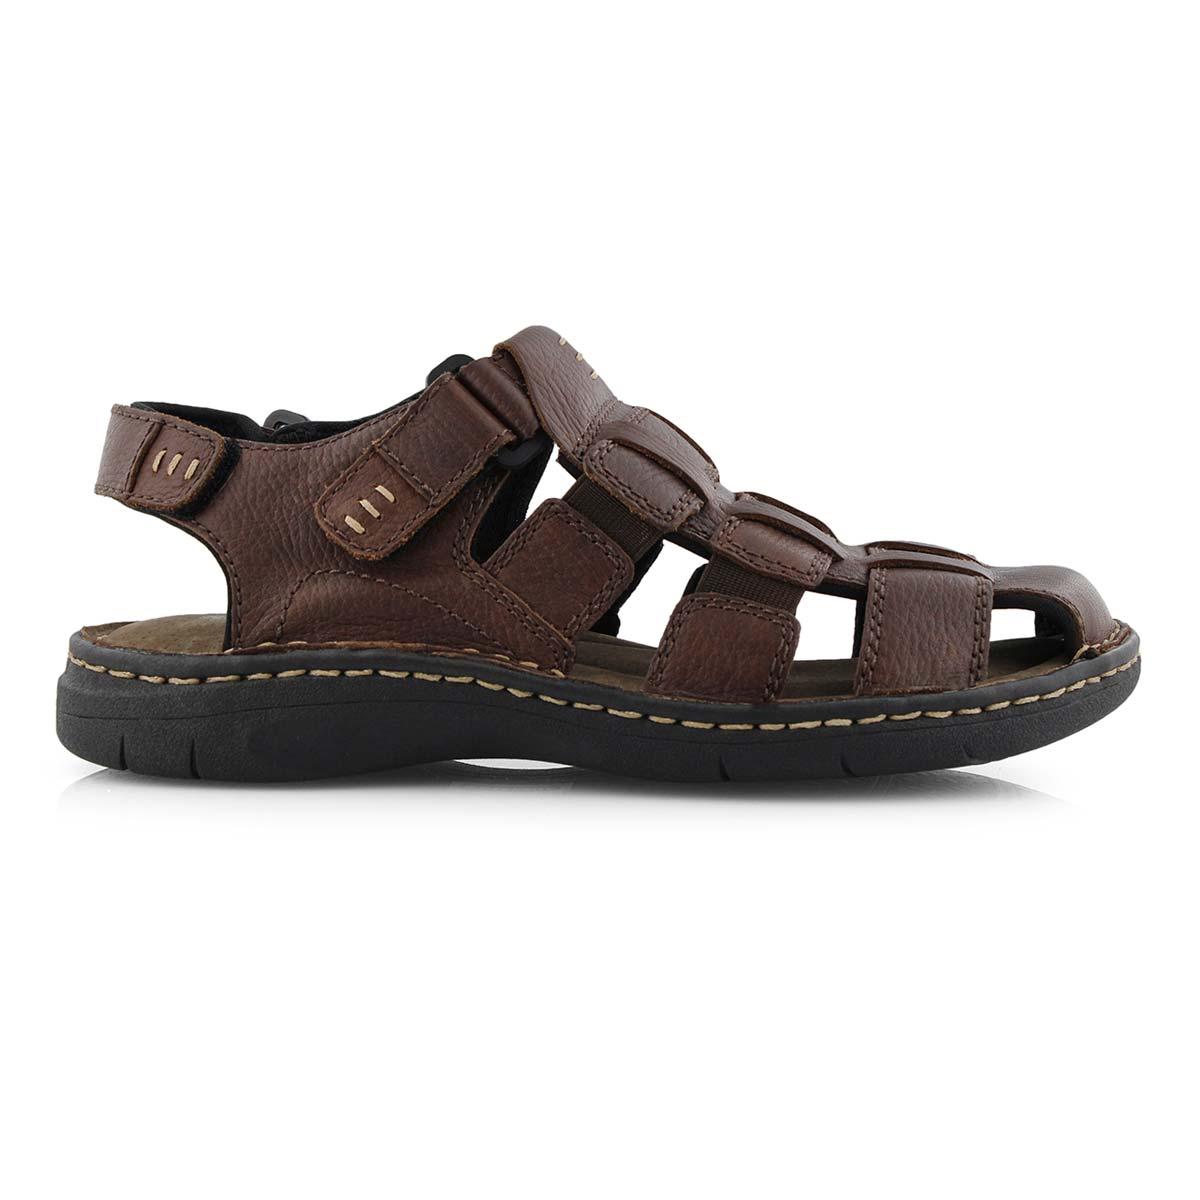 Mns Charles 5 brown fisherman sandal